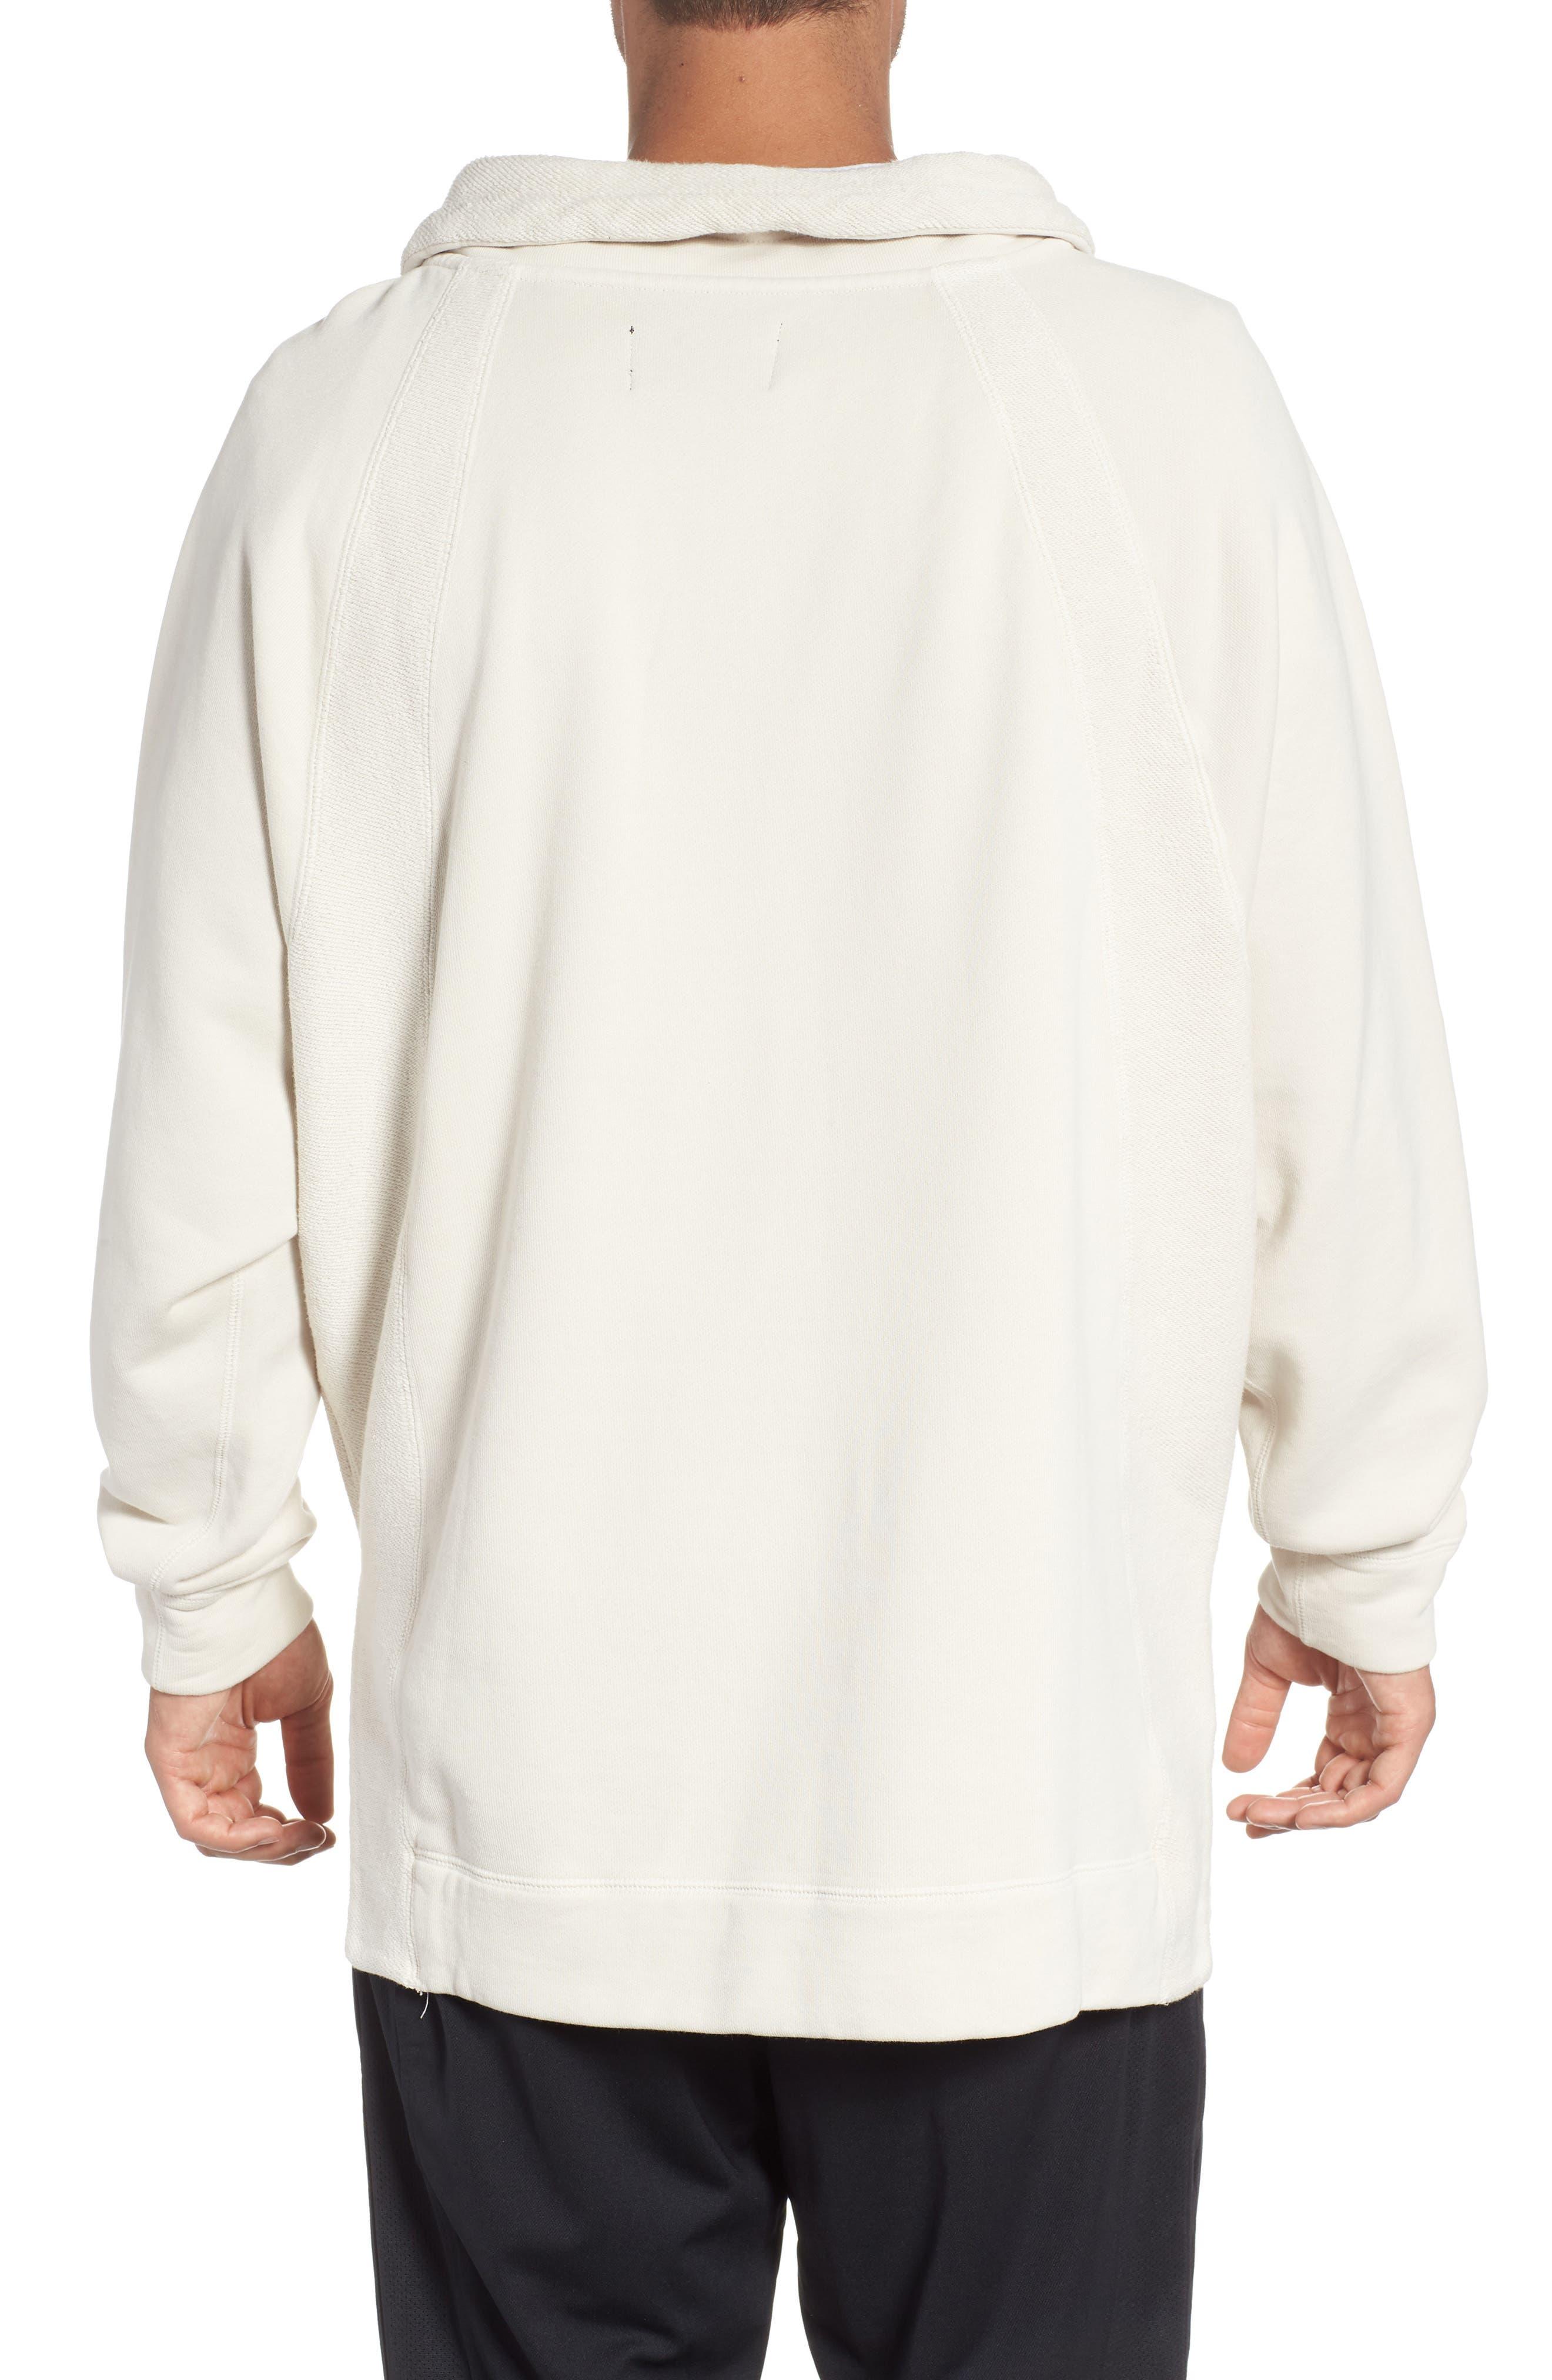 Jordan Wings Washed Quarter Zip Sweatshirt,                             Alternate thumbnail 2, color,                             LIGHT BONE